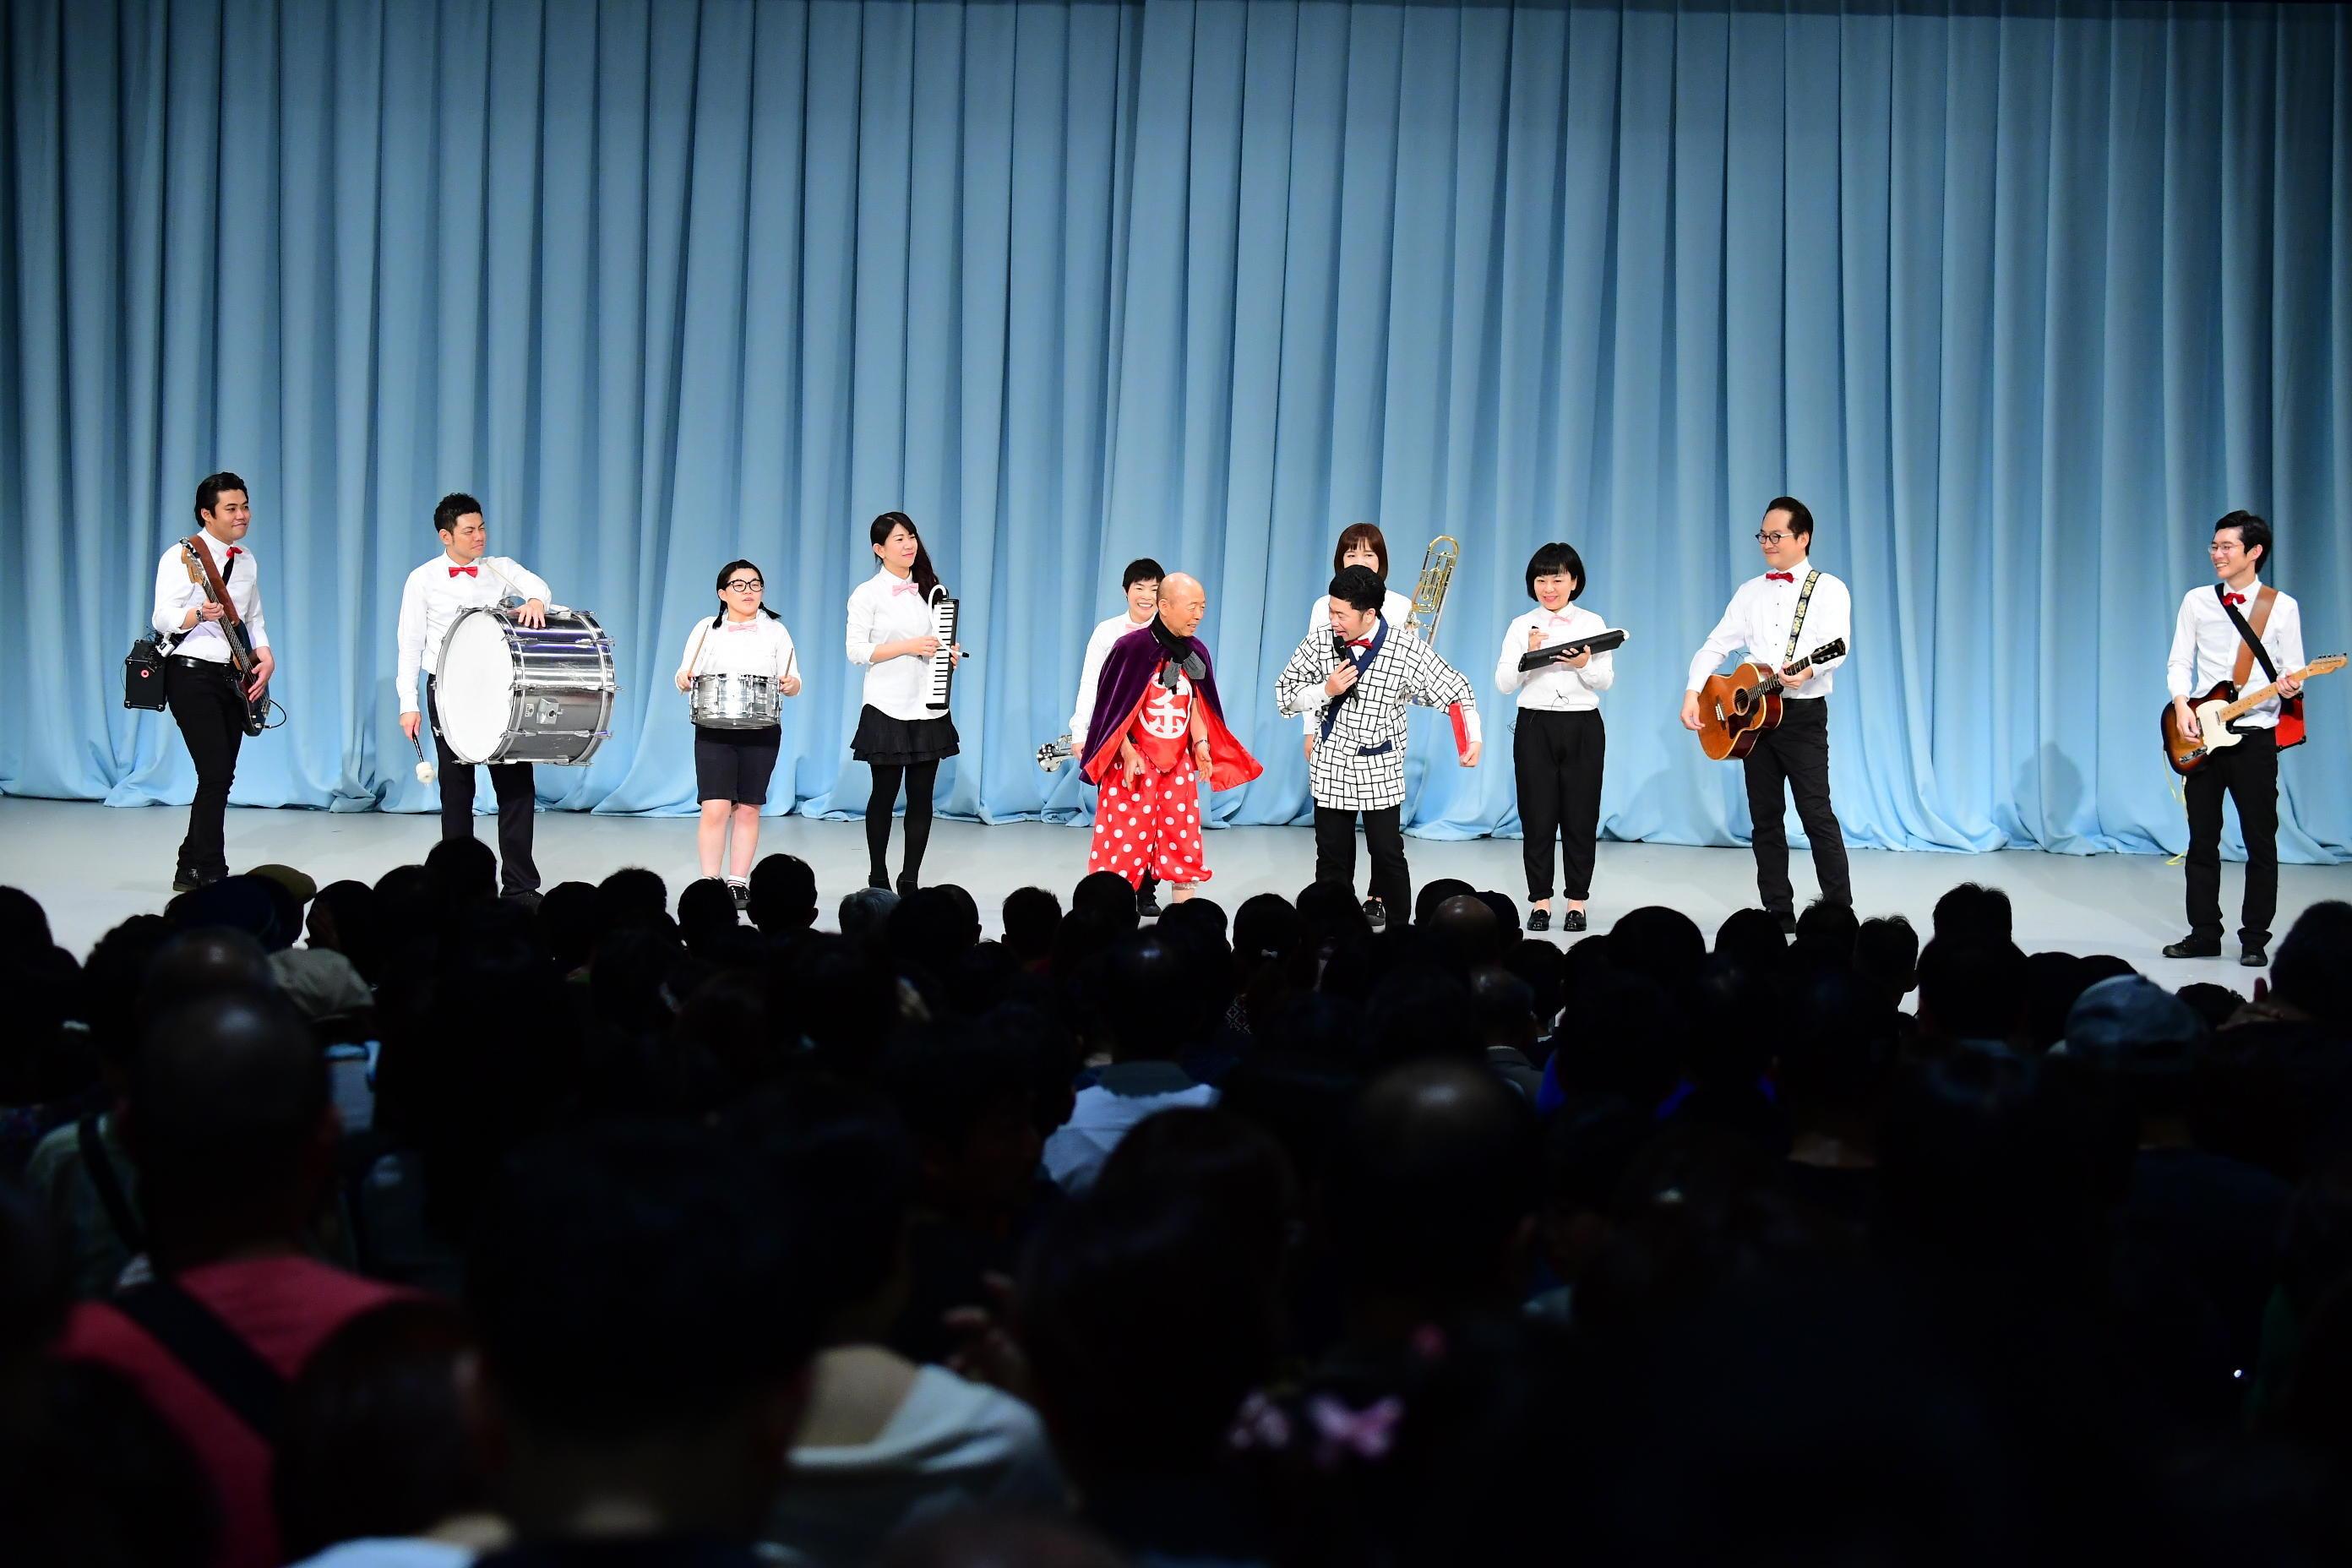 http://news.yoshimoto.co.jp/20170925160900-96b20b3f18669e2675a06881ed9287e52e467fa5.jpg